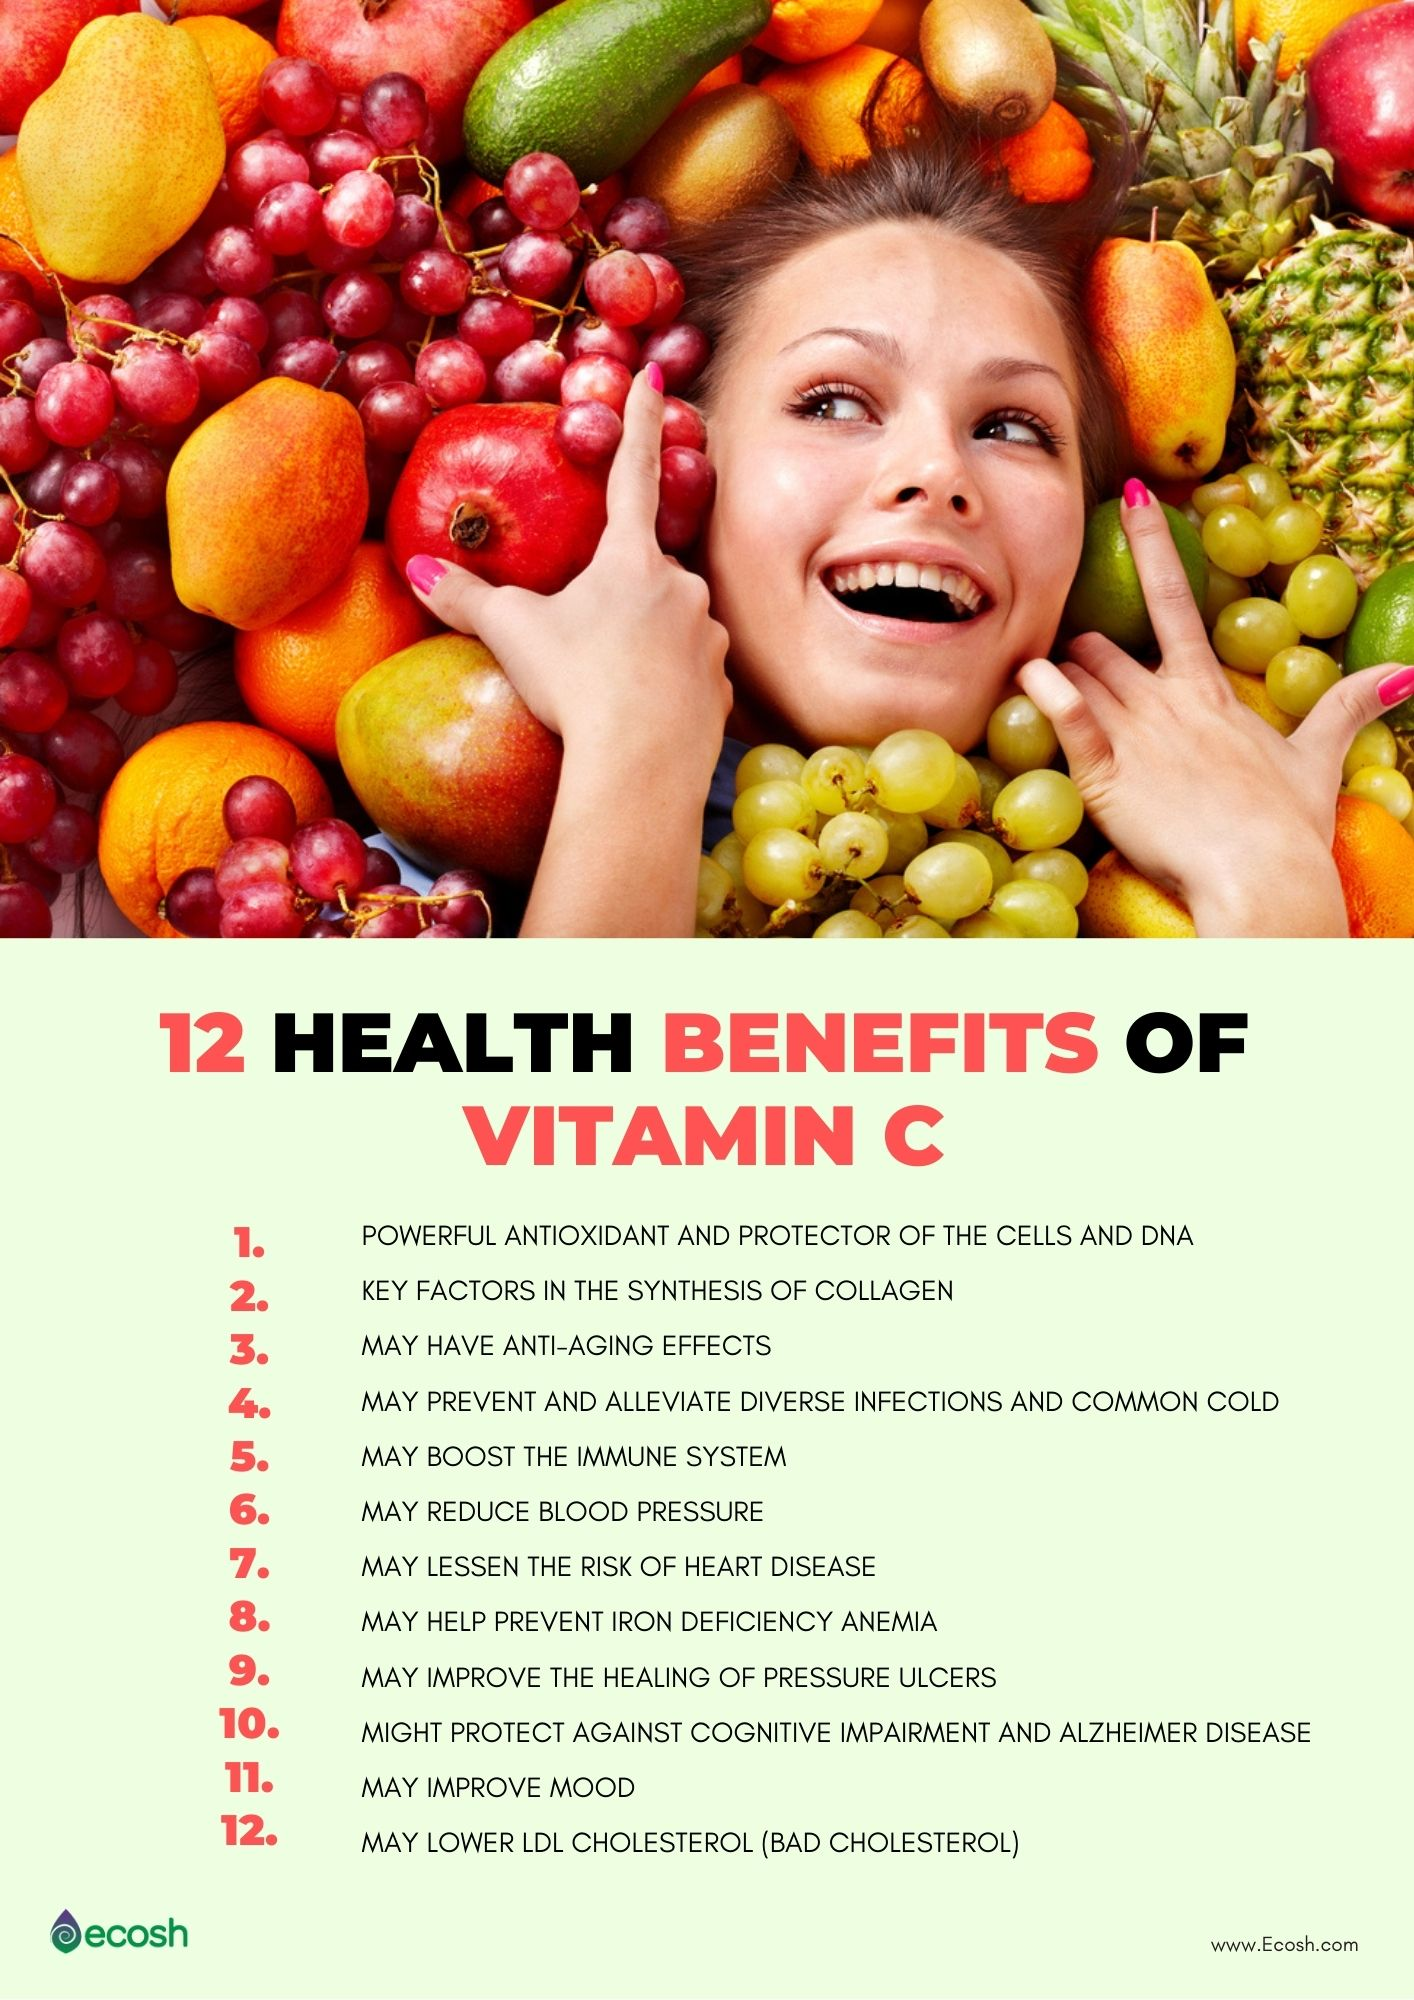 vitamin c - 12 health benefits and 24 vitamin c rich foods